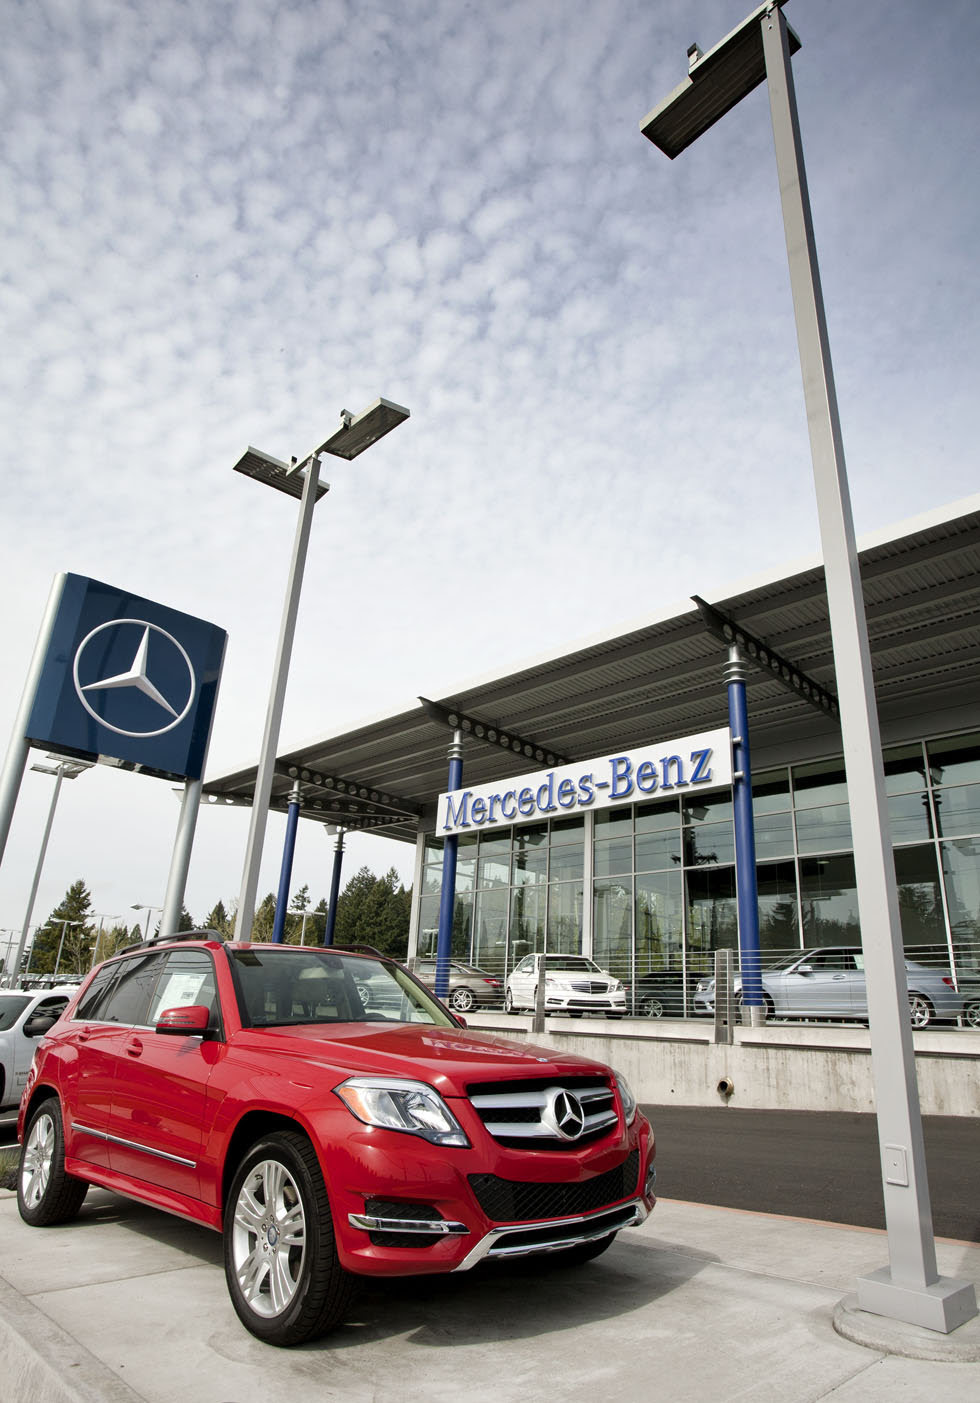 Mercedes-Benz opens sleek Beaverton location | OregonLive.com